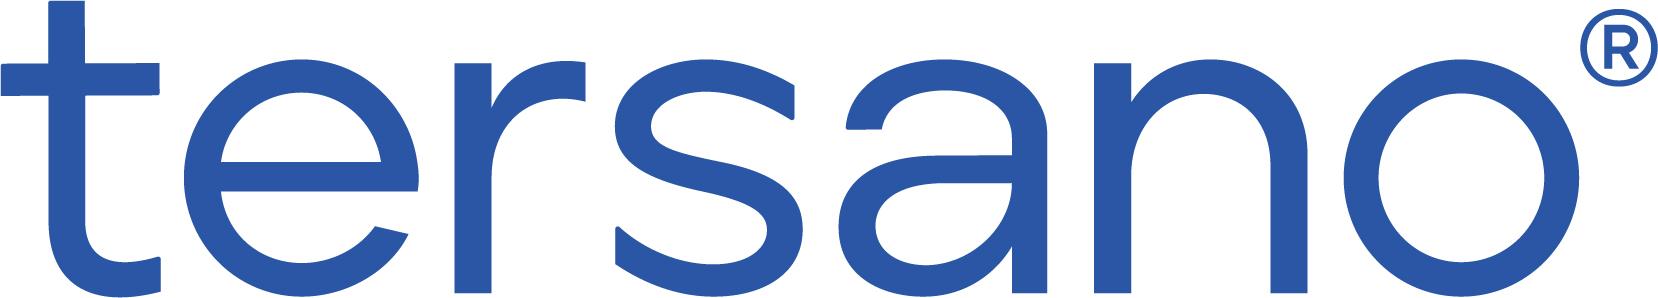 Tersano, Inc. logo